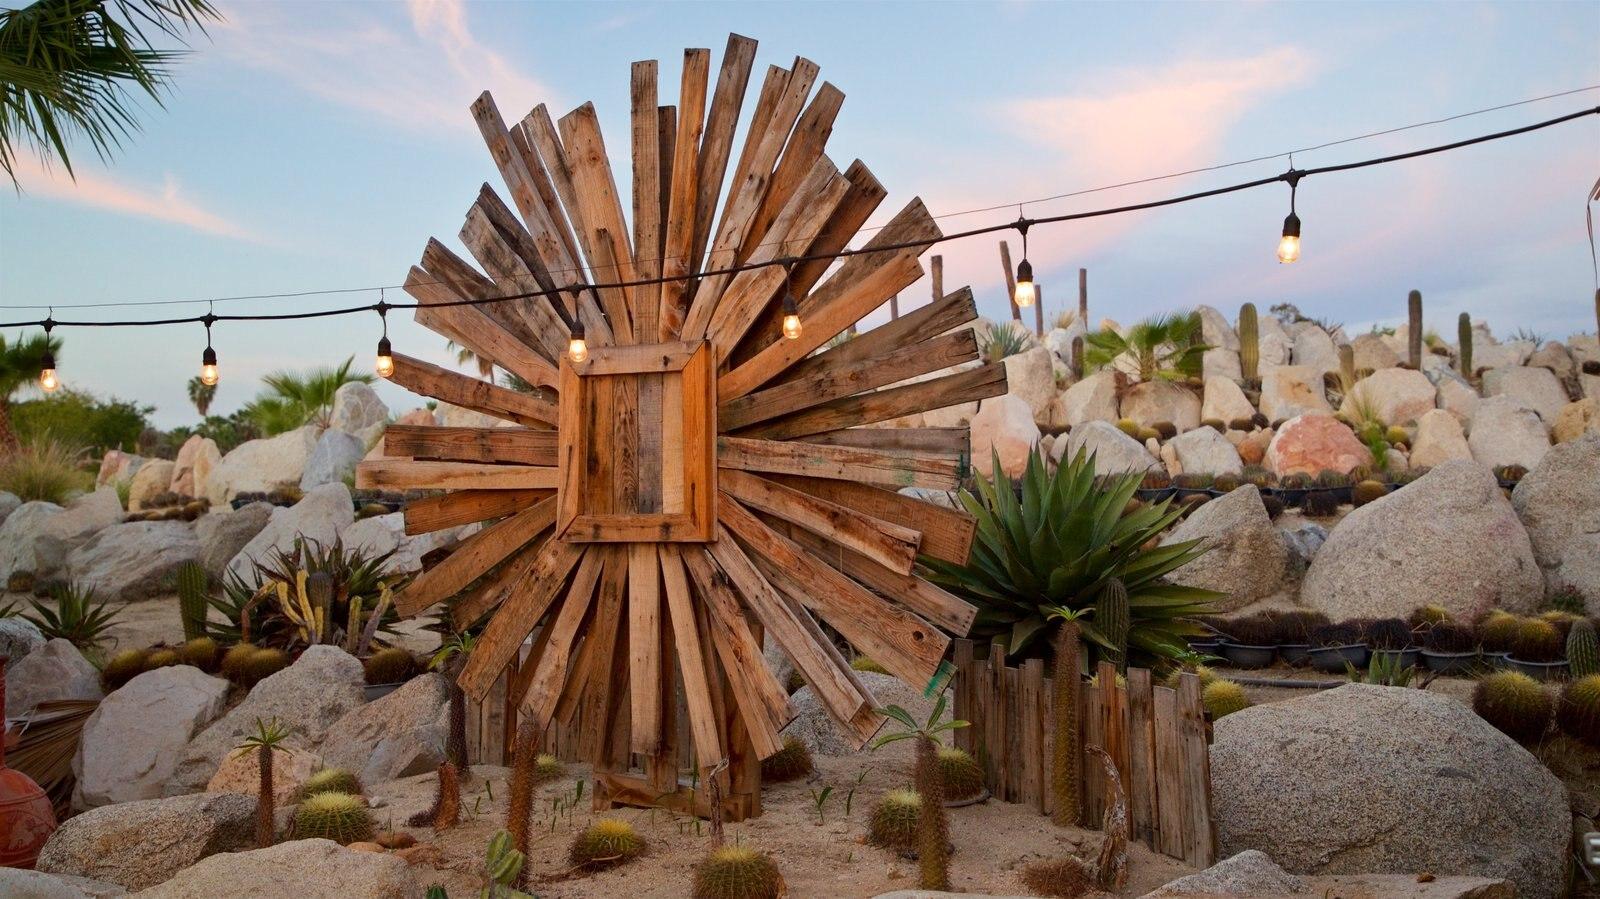 Wirikuta Garden showing outdoor art and a sunset